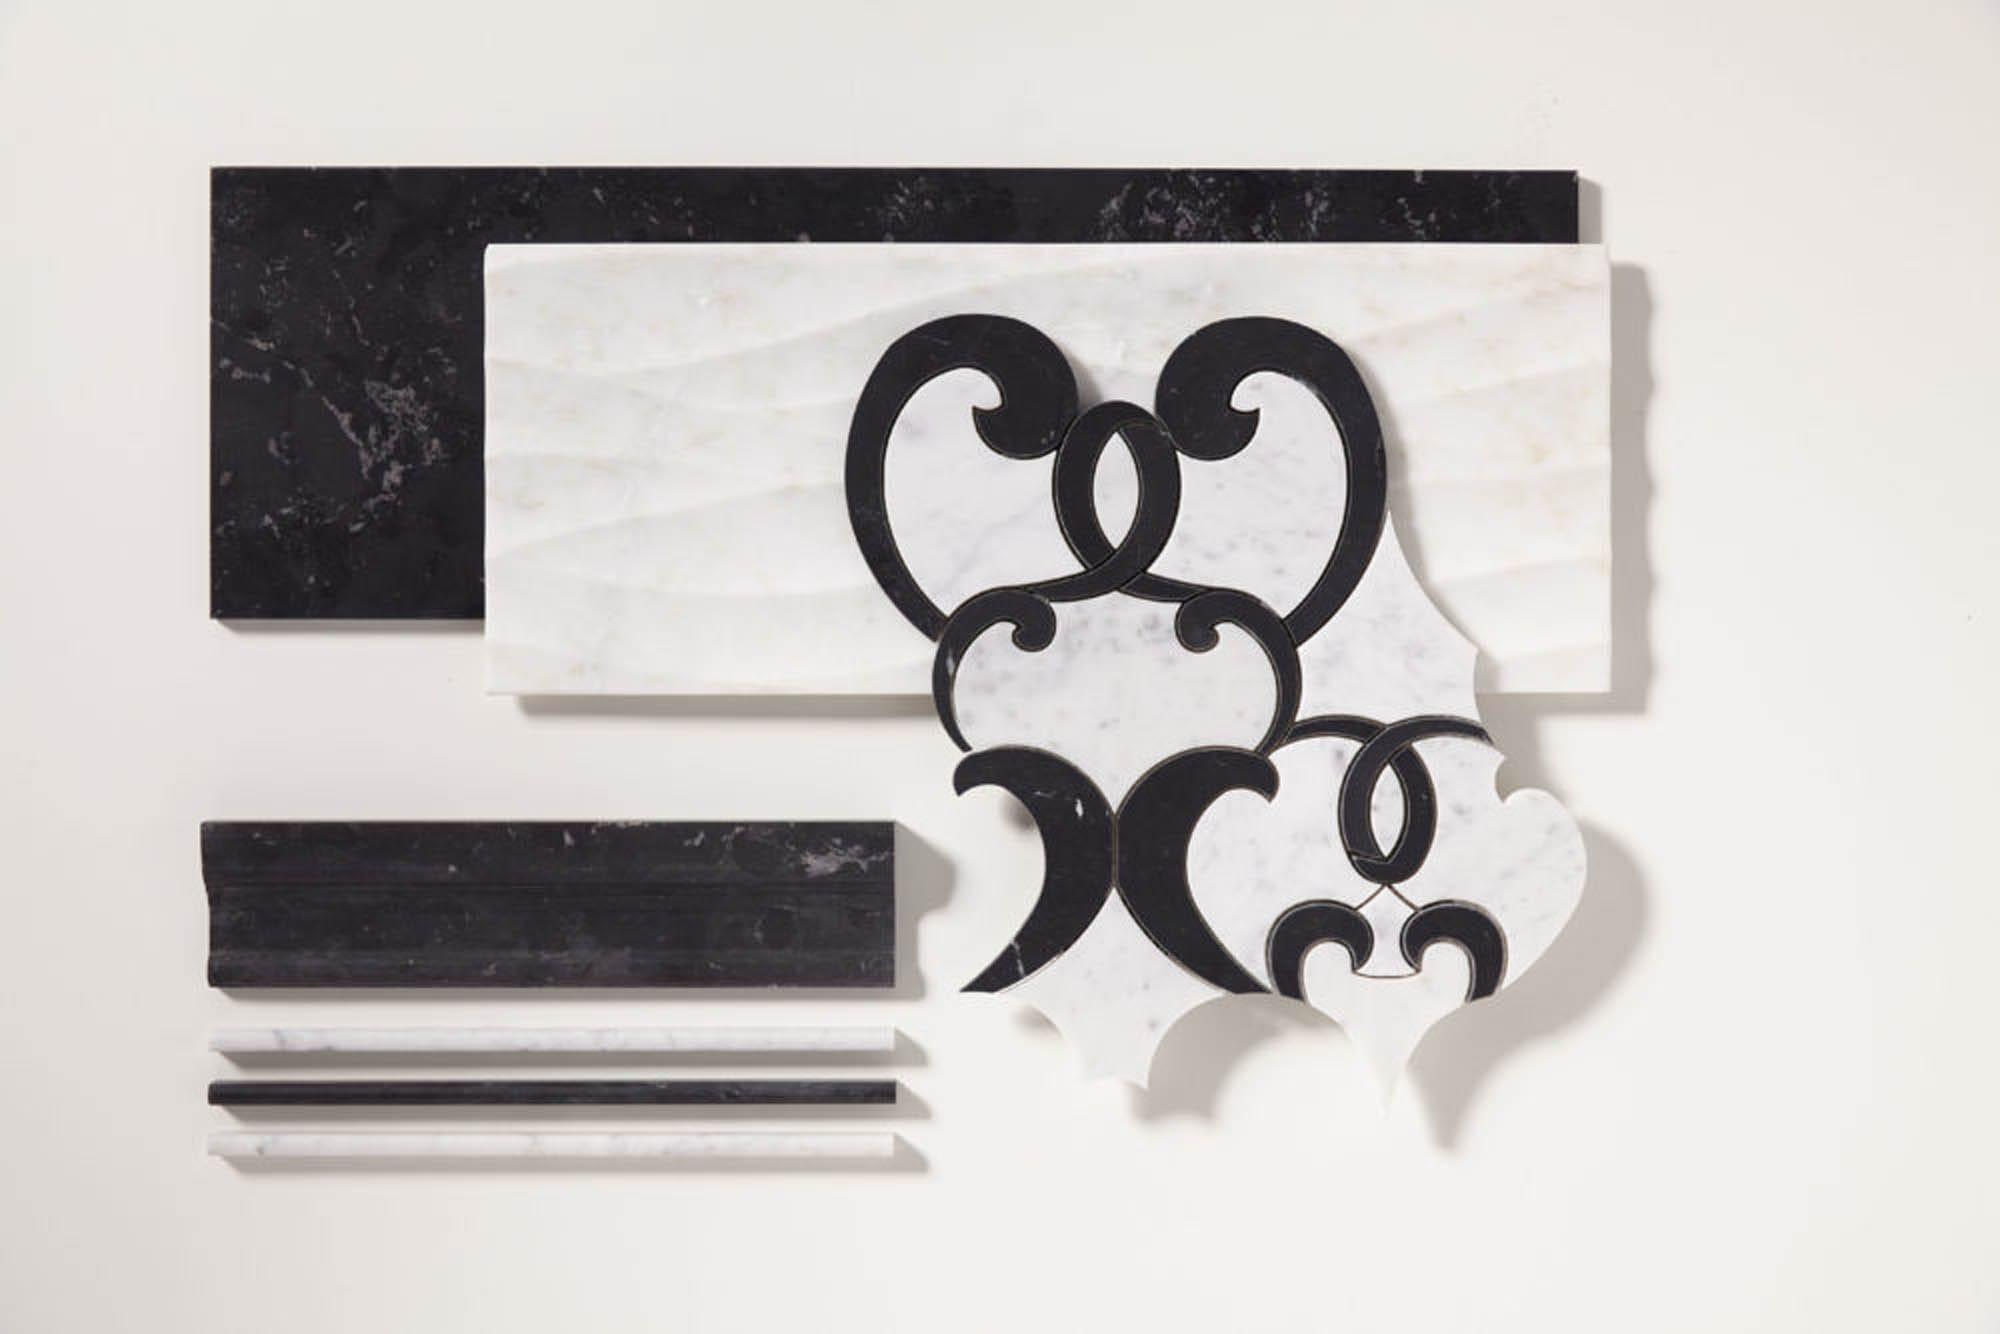 mosaic, black and white tile